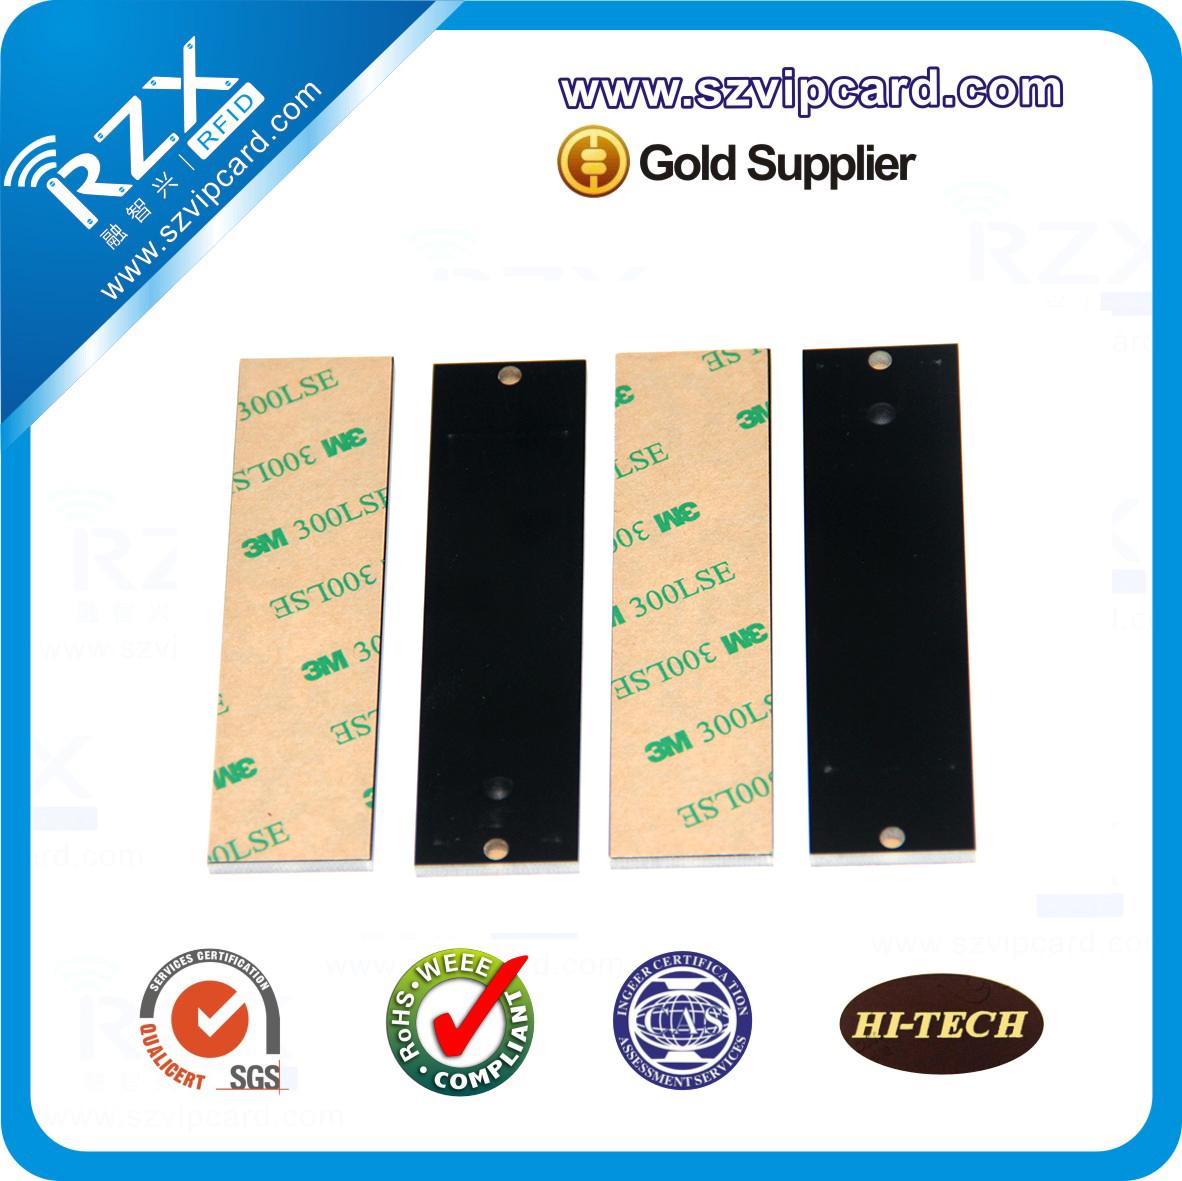 9525(H3)特种超高频电子标签